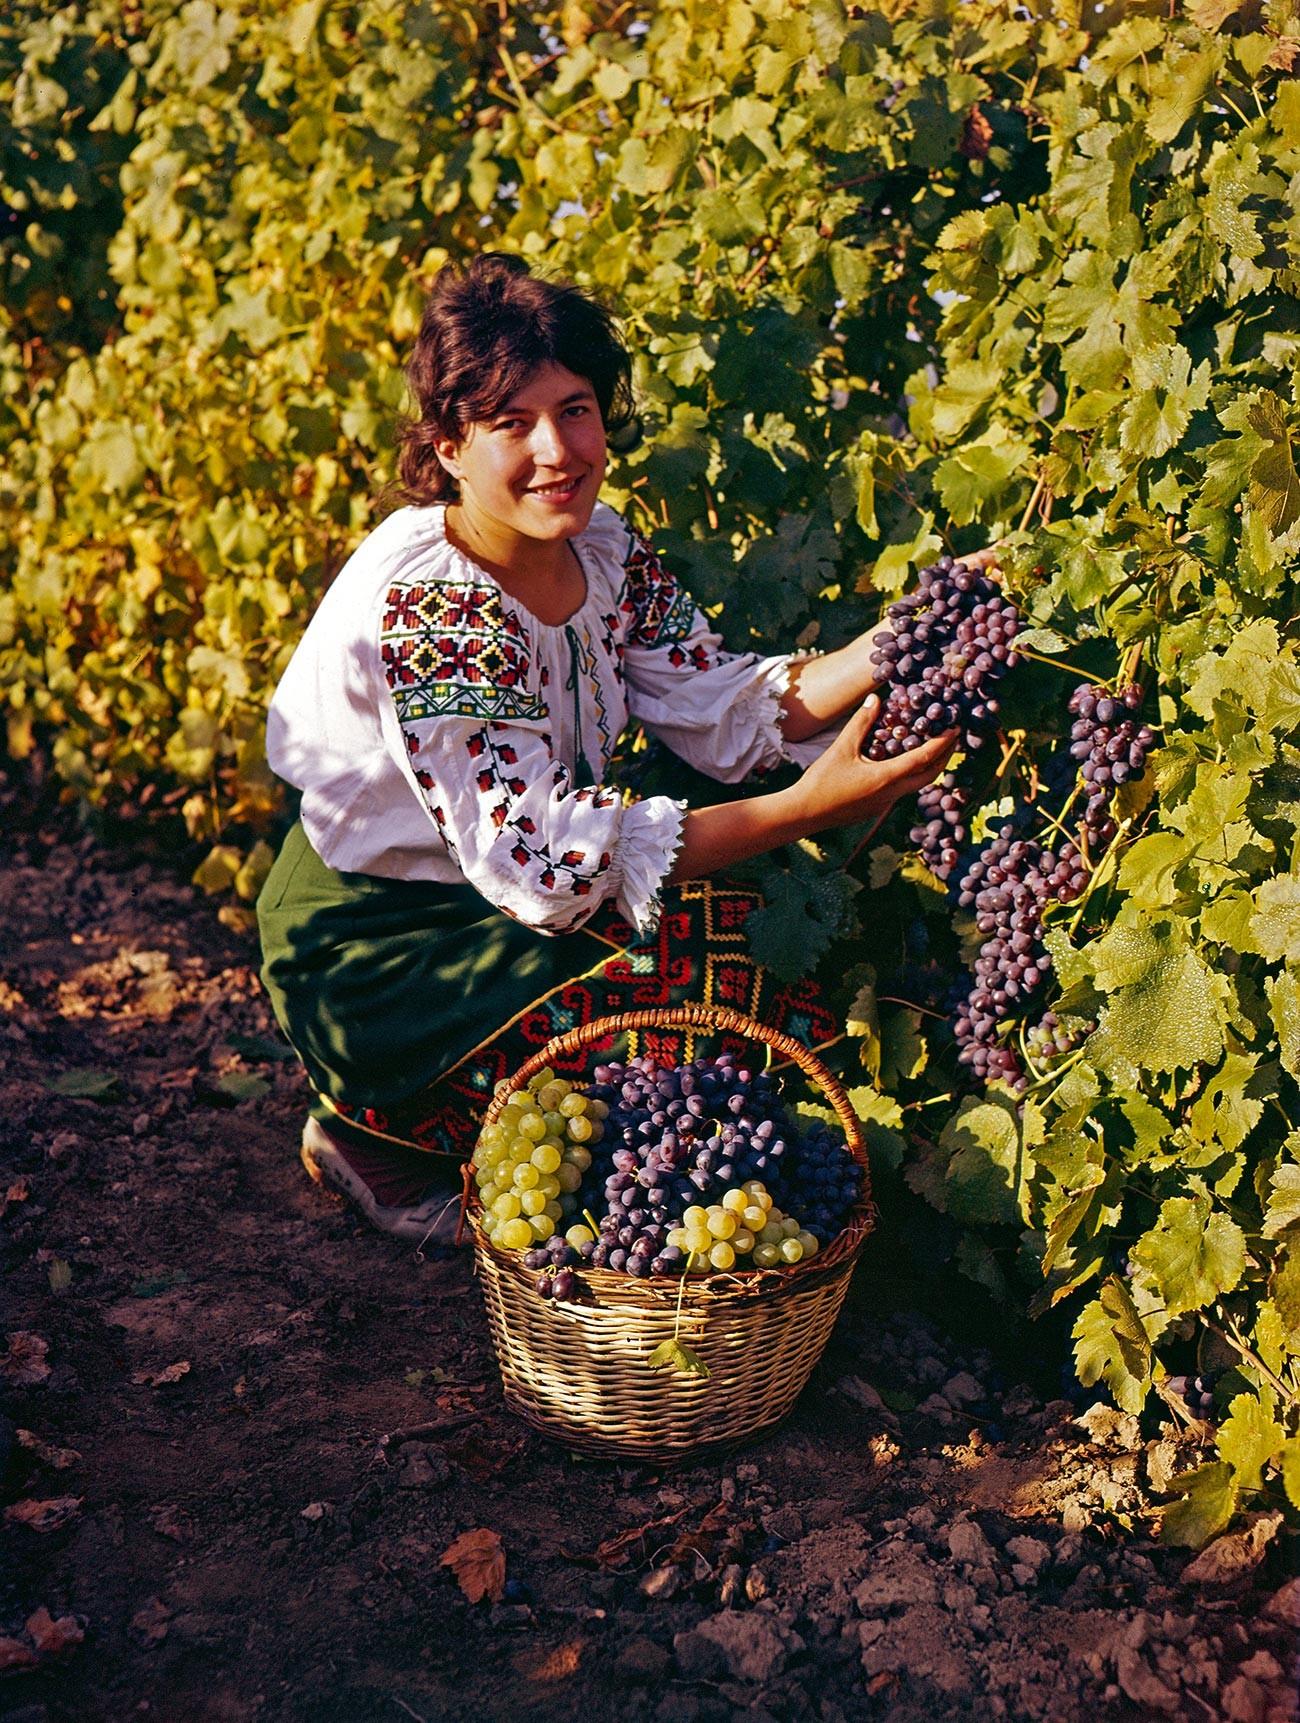 Grape harvest in the Moldavian SSR, 1972